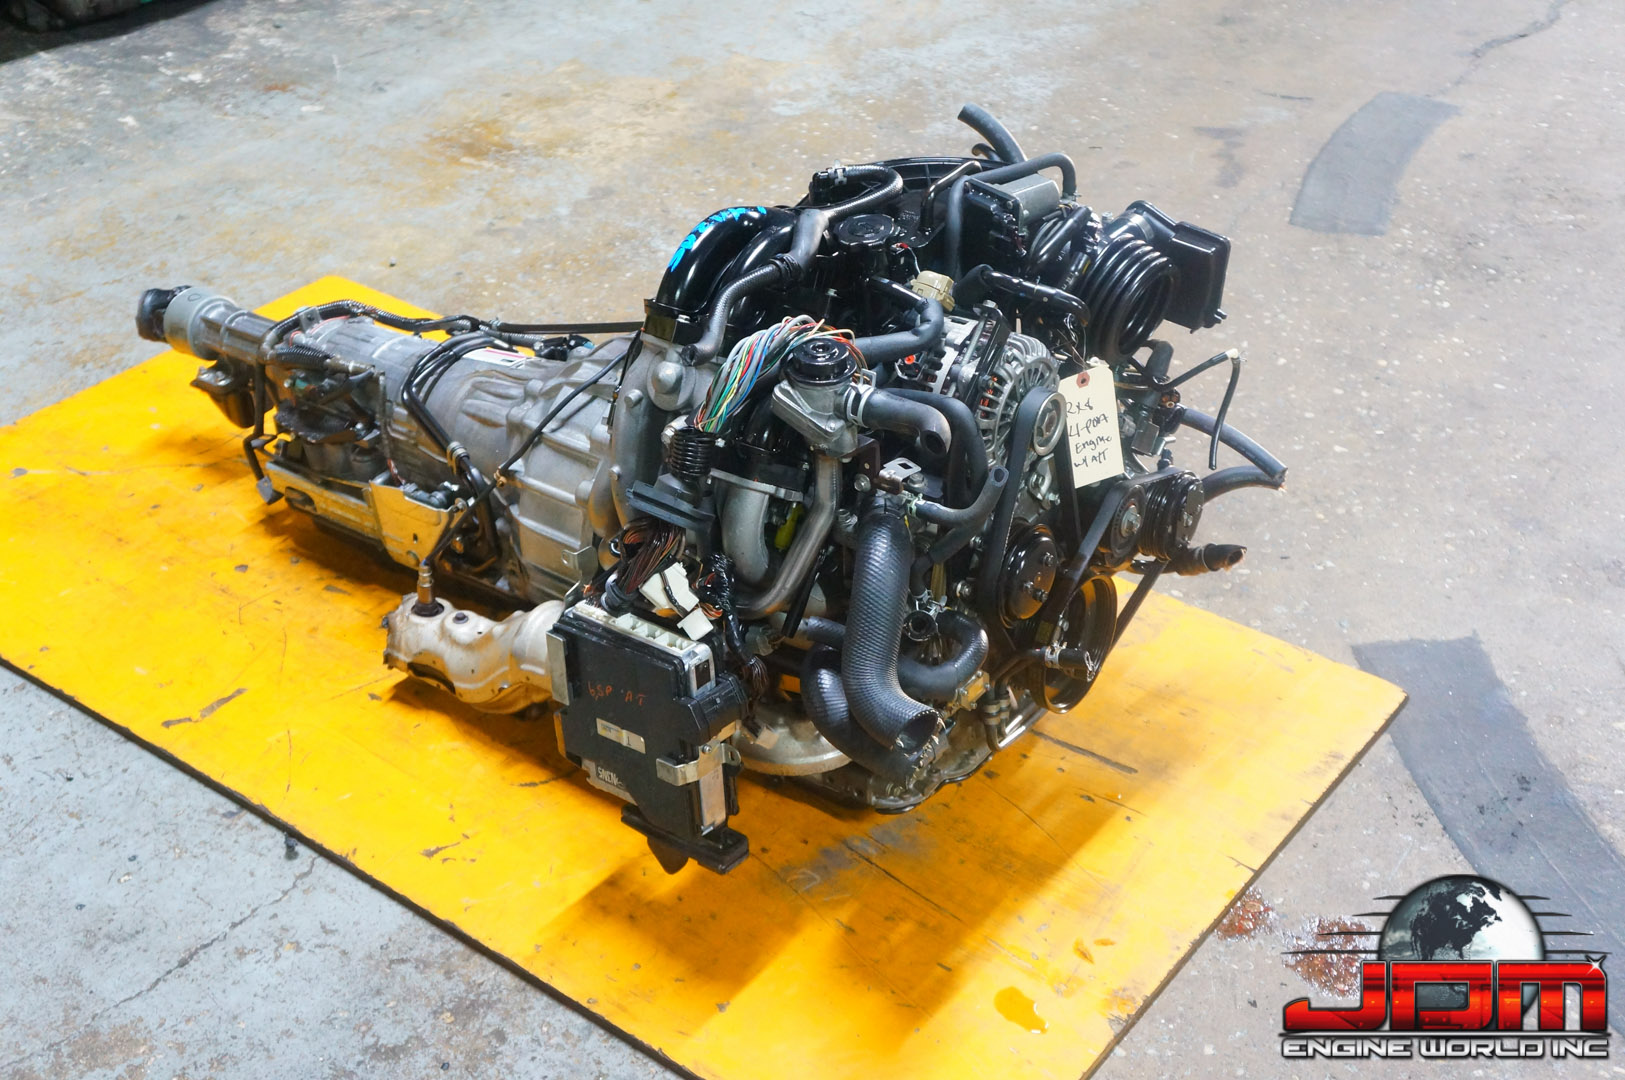 JDM MAZDA RX8 6-PORT ENGINE w/ 6 SPD AUTOMATIC TRANSMISSION